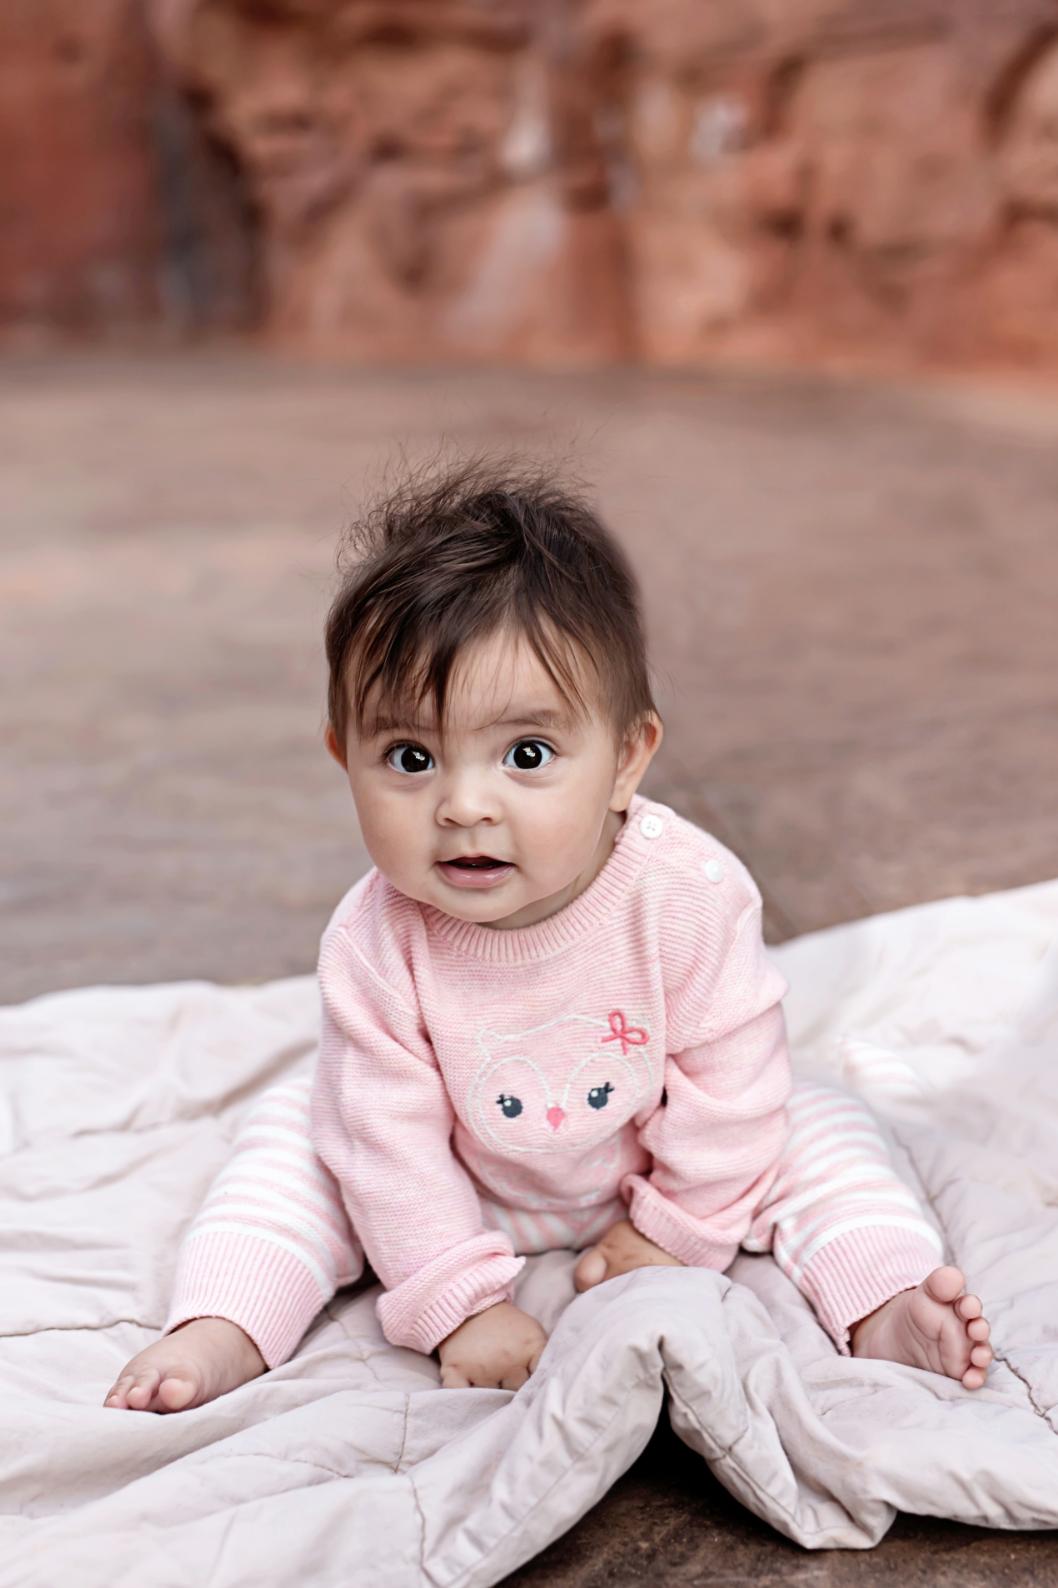 baby-sitting-on-blanket